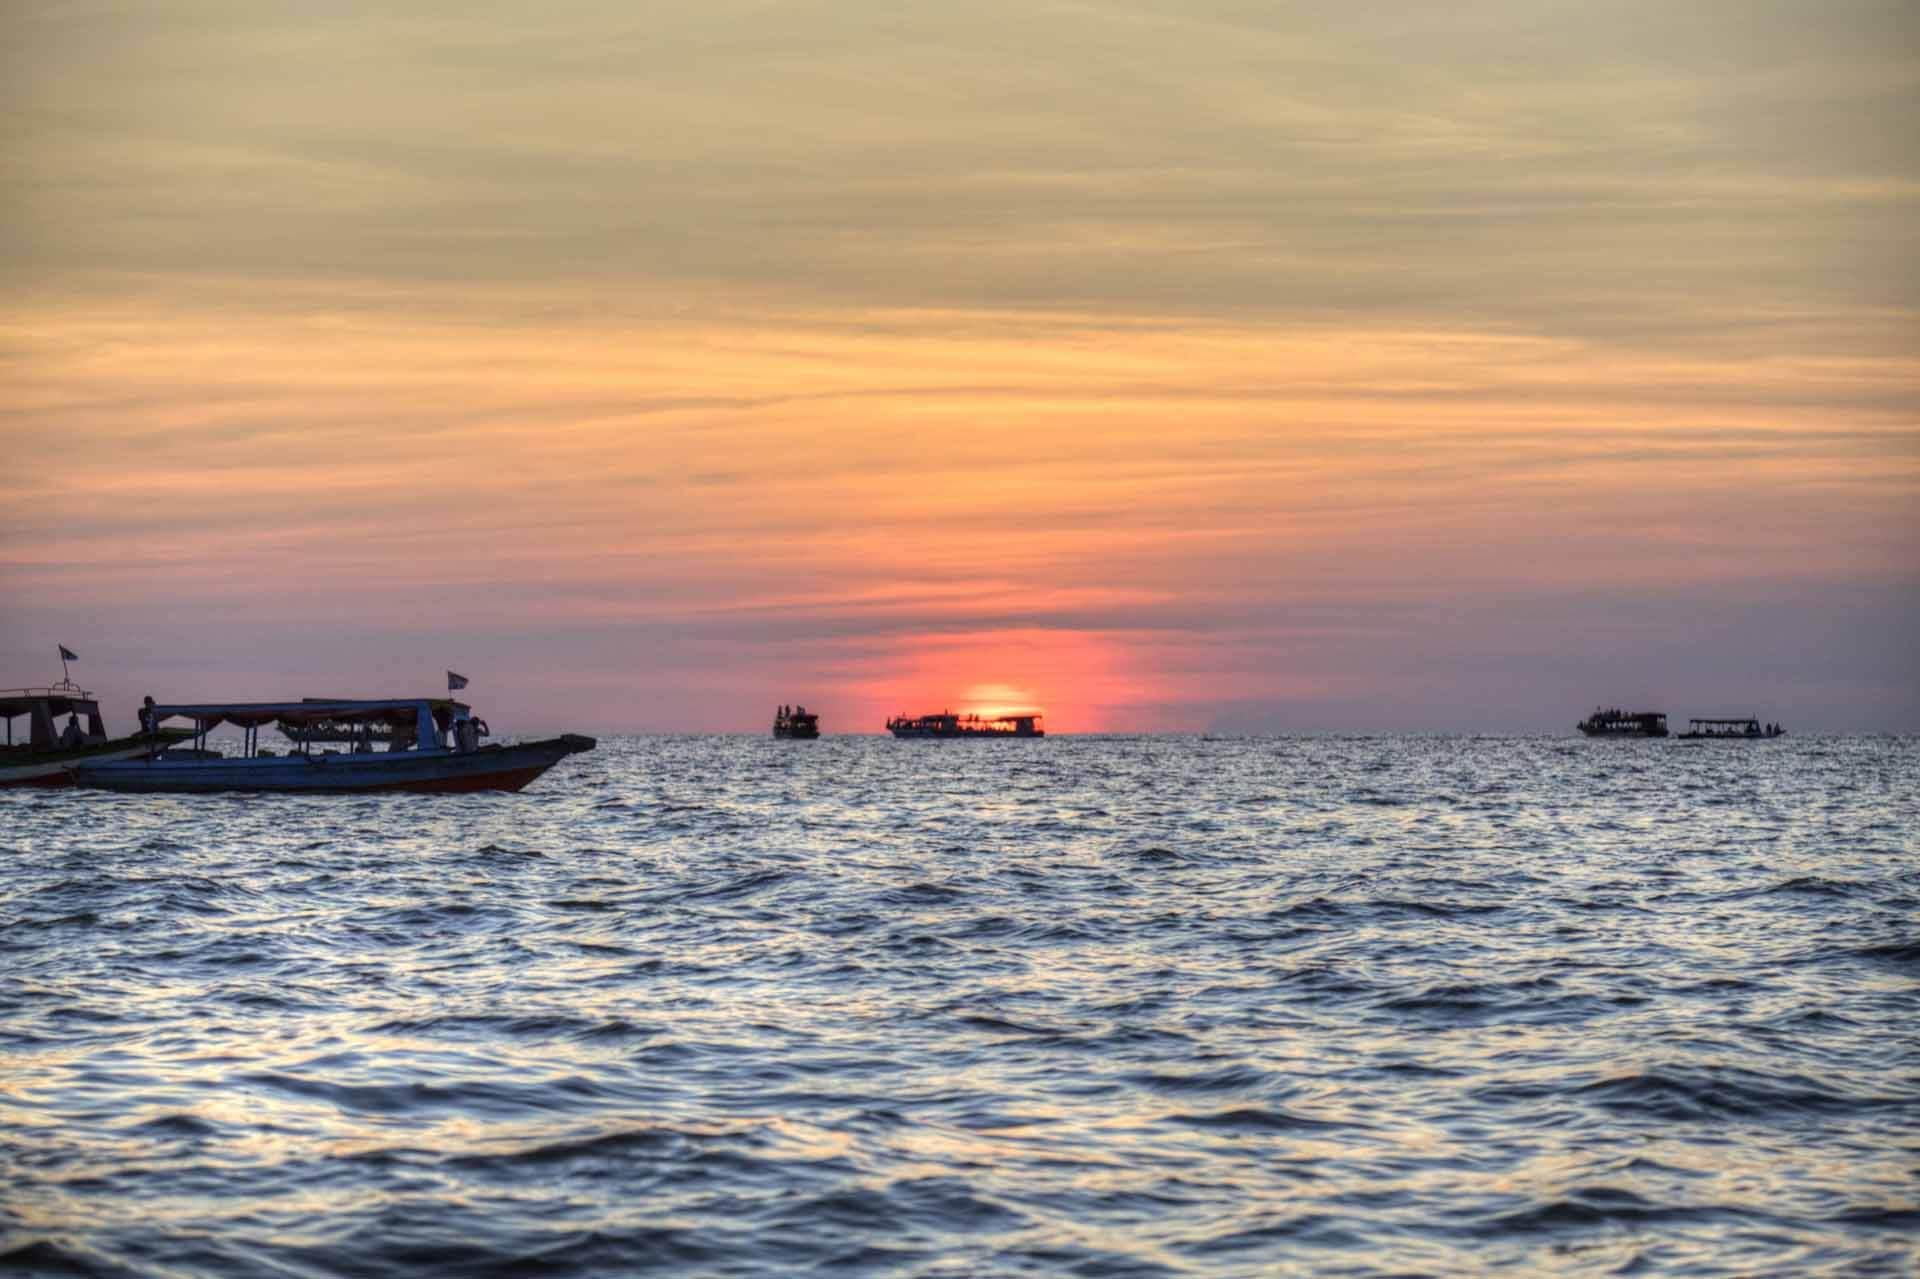 Tonle-Sap-See: Sonnenuntergang in Kambodscha